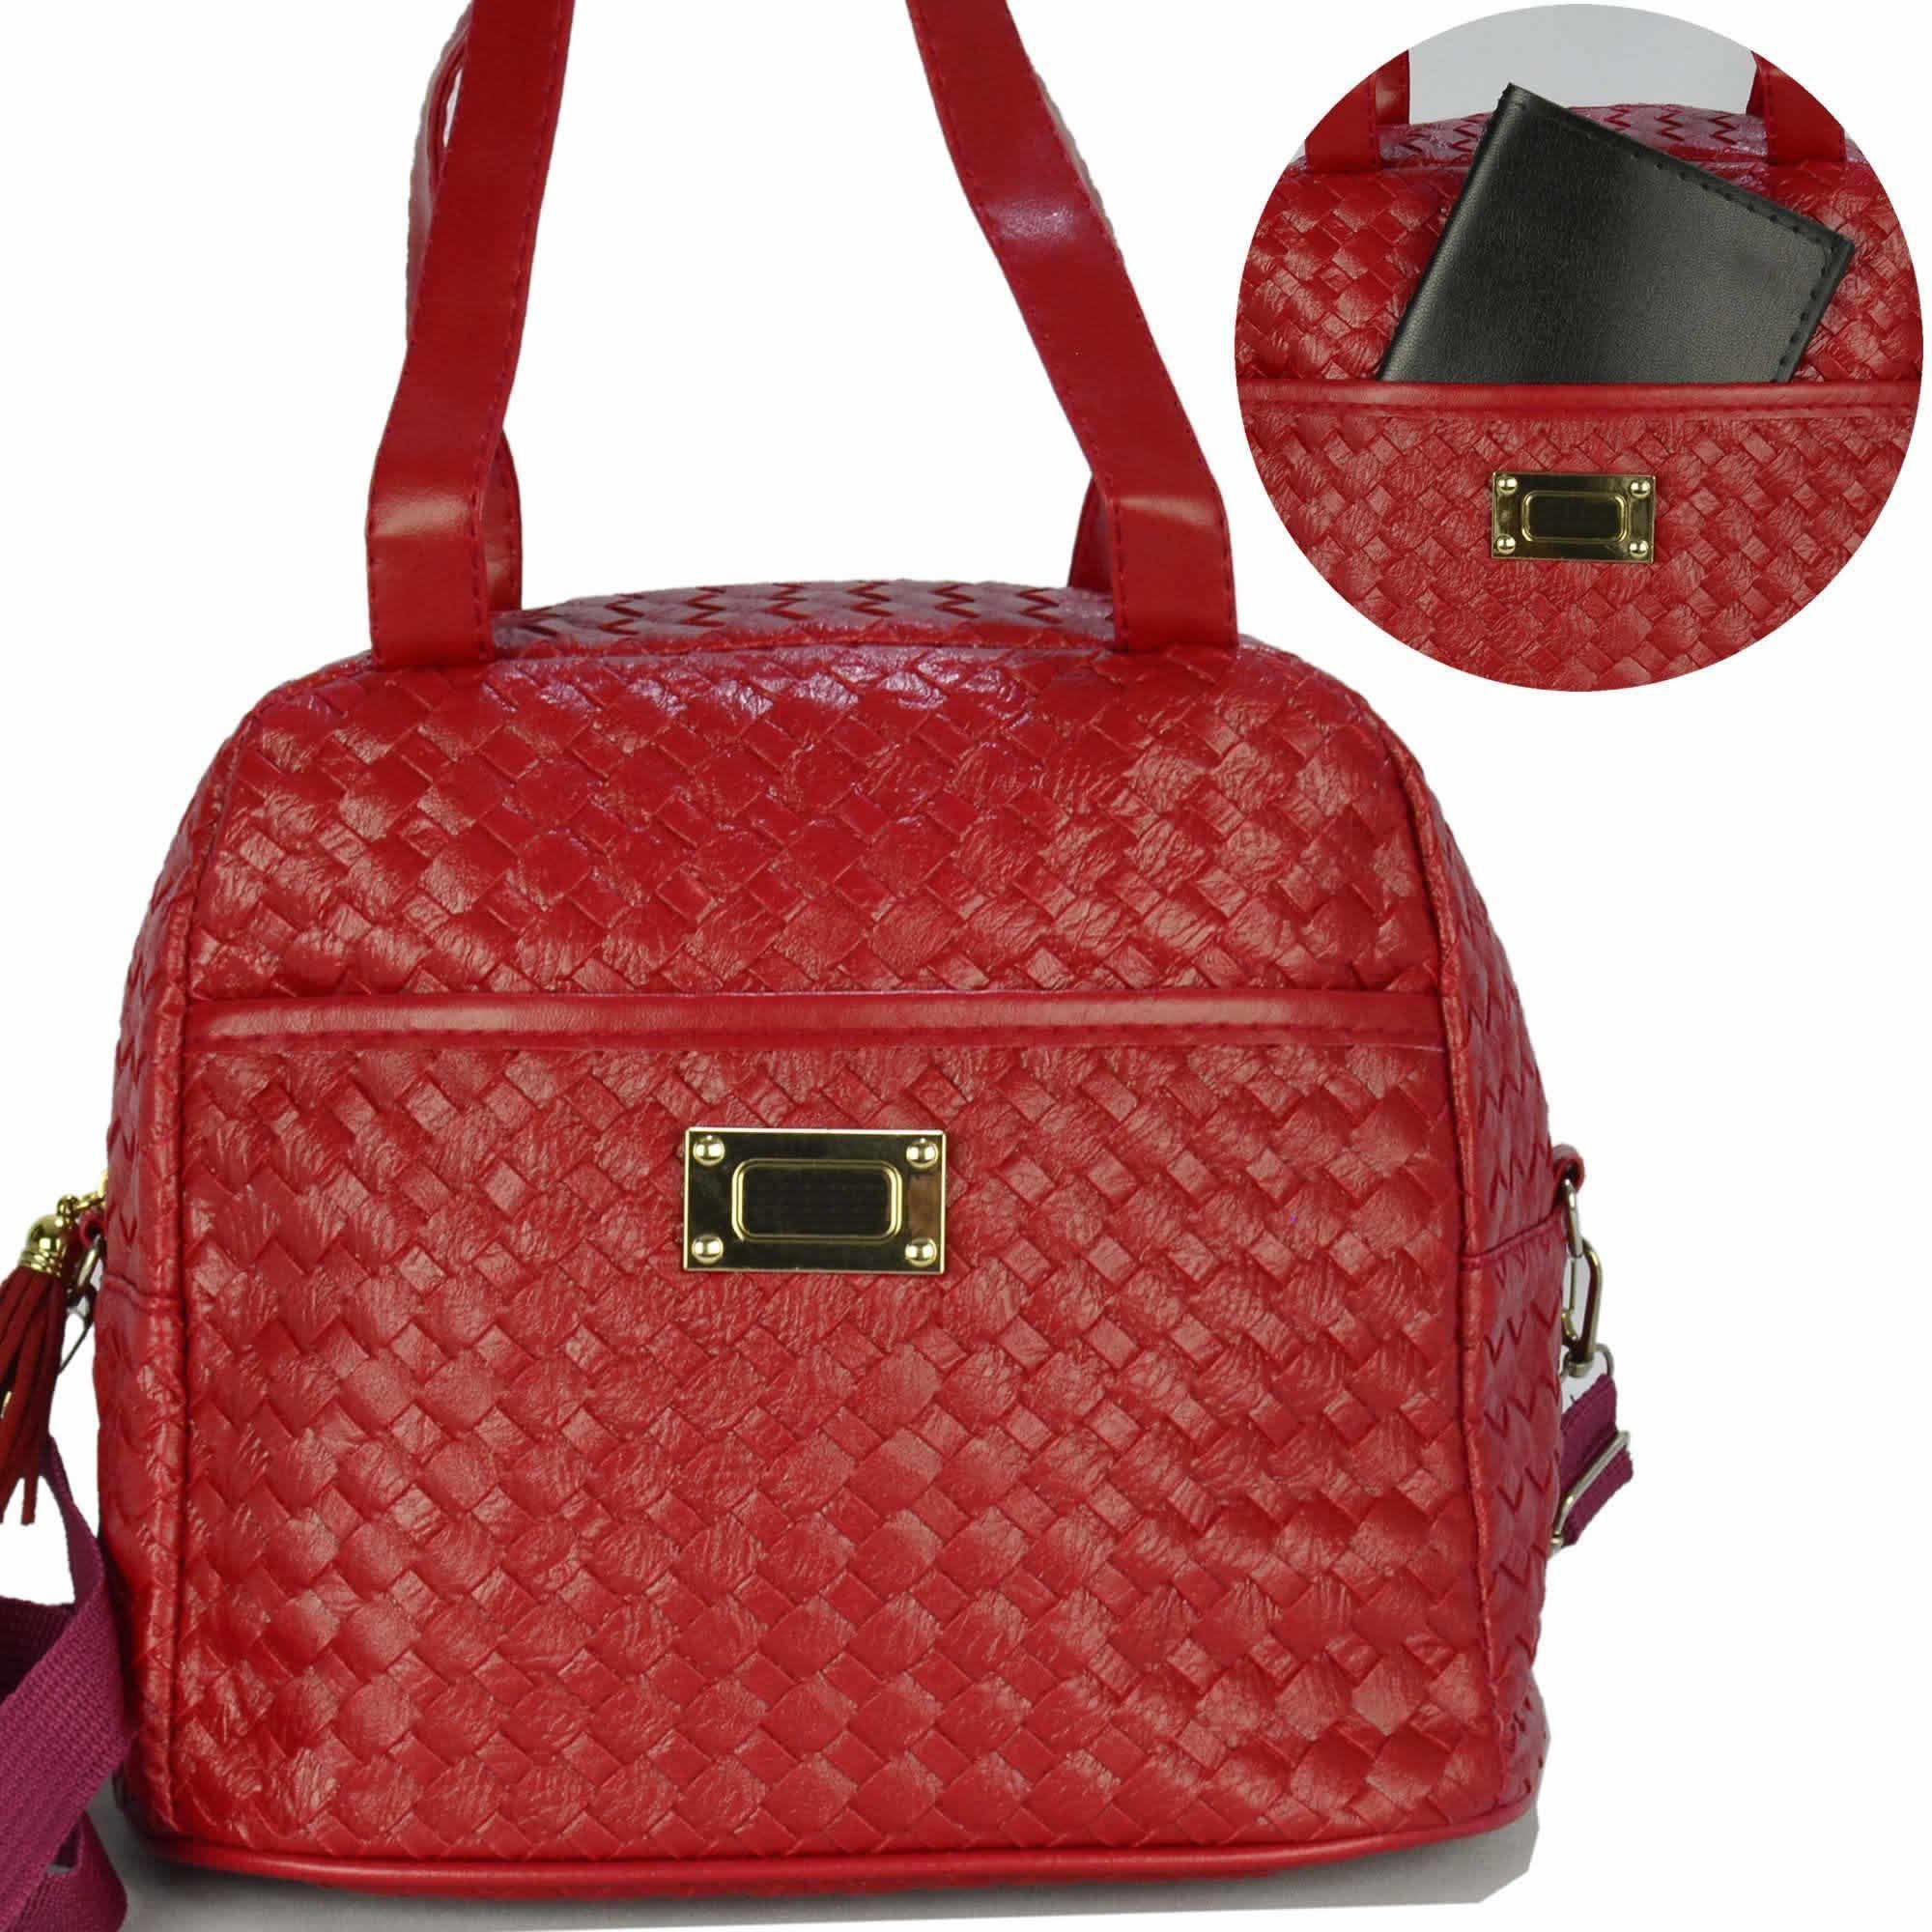 Nécessaire Feminina Bolsa Térmica Luxo Vermelho CBRN07943